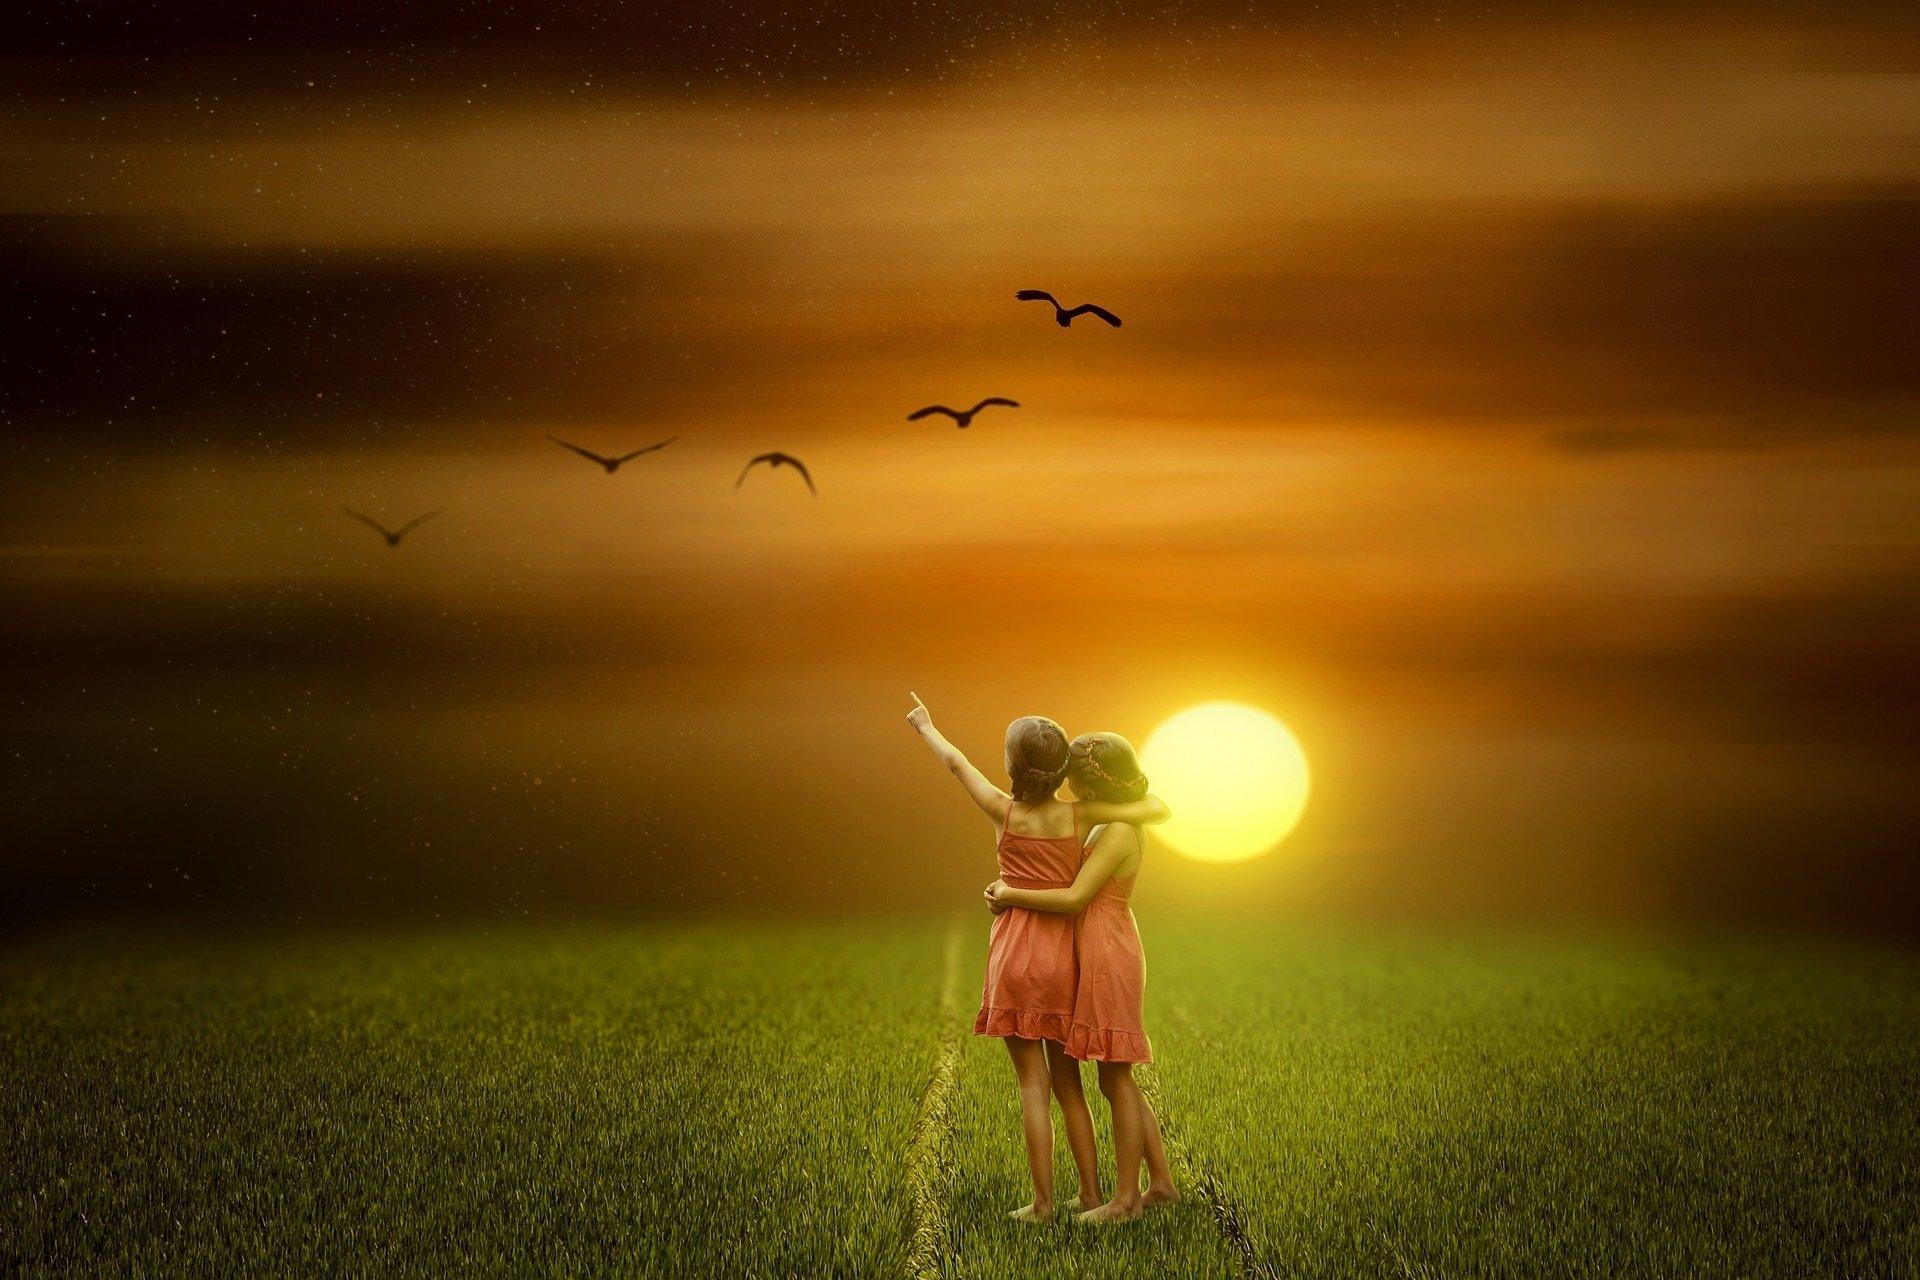 Bandoska, piosenka ludowa dla dzieci, tekst i melodia